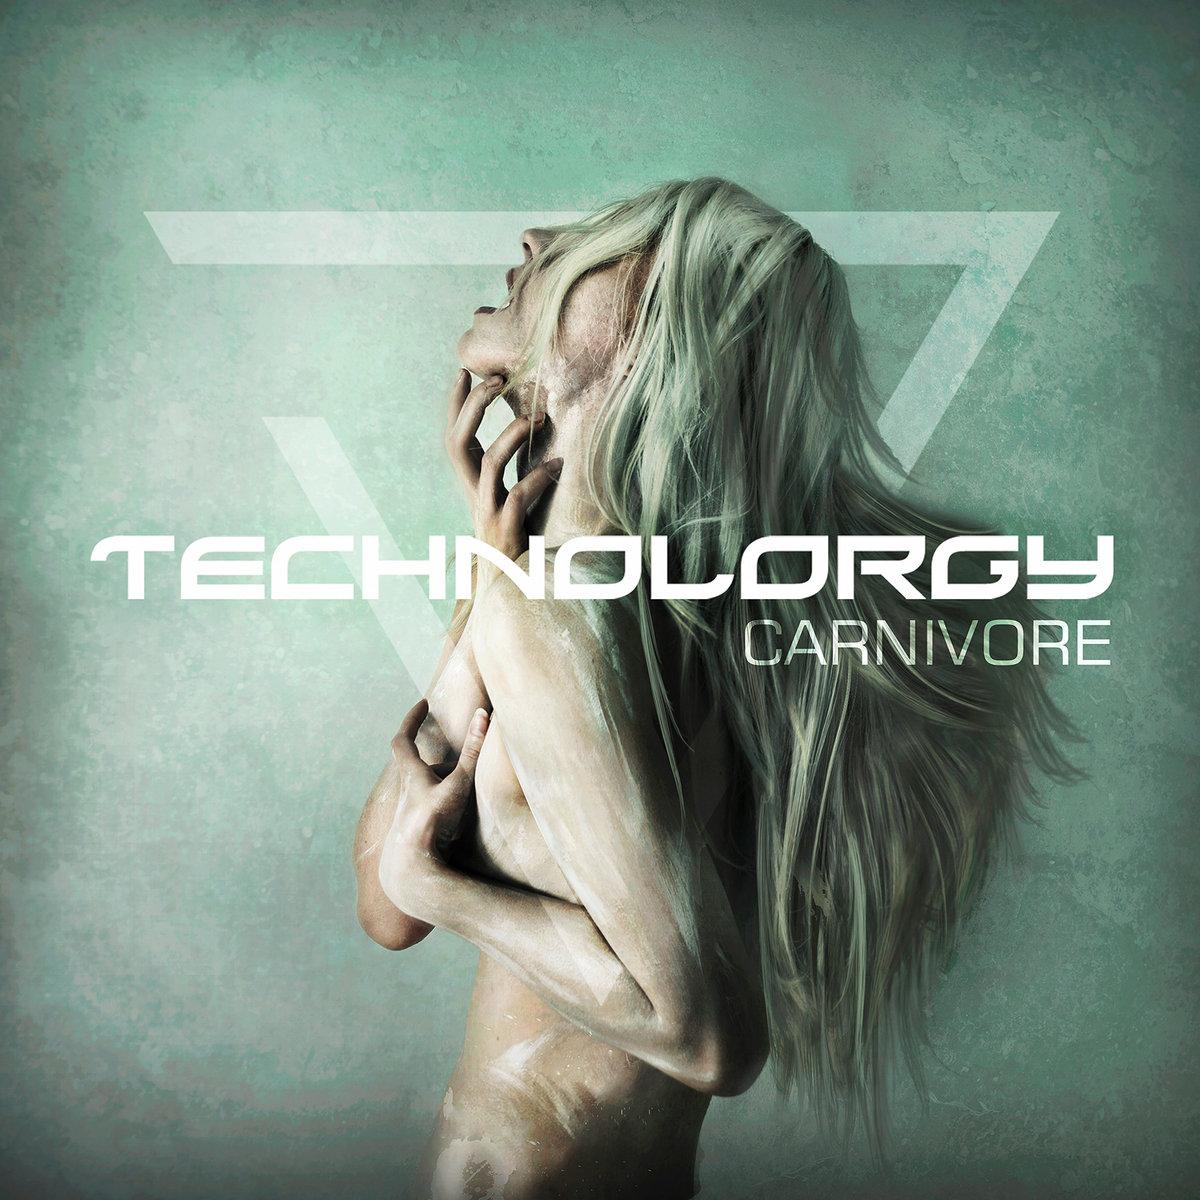 Technolorgy-Carnivore-Limited Edition-CDM-FLAC-2020-FWYH